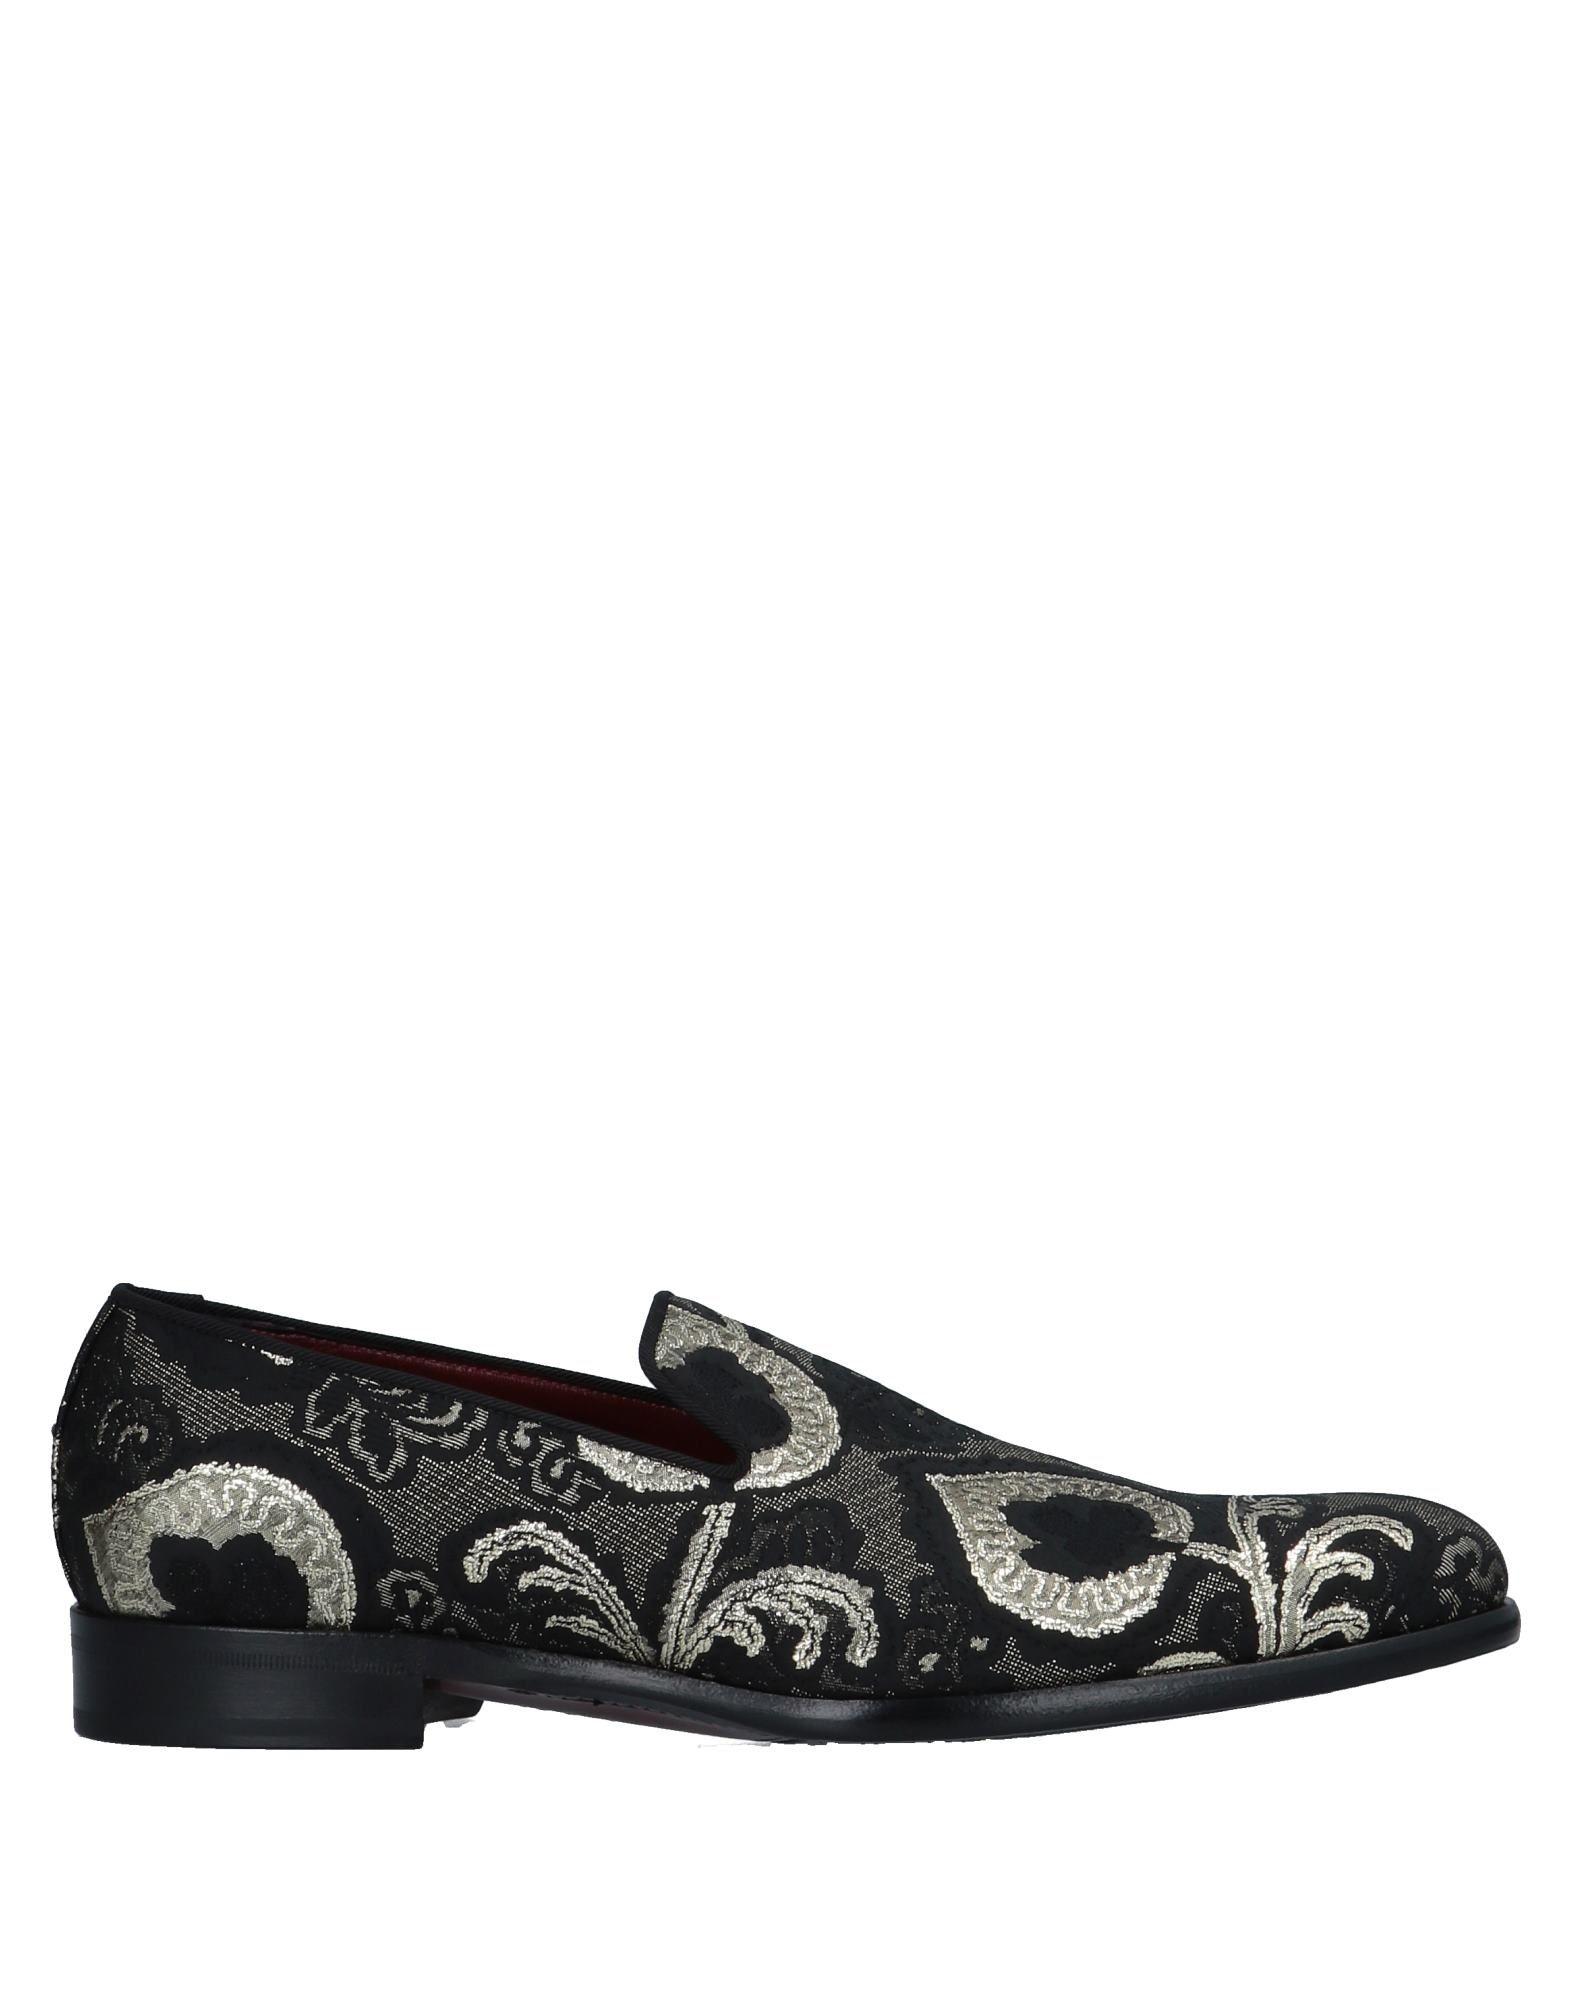 Dolce & Gabbana Mokassins Herren  11508165HL Gute Qualität beliebte Schuhe